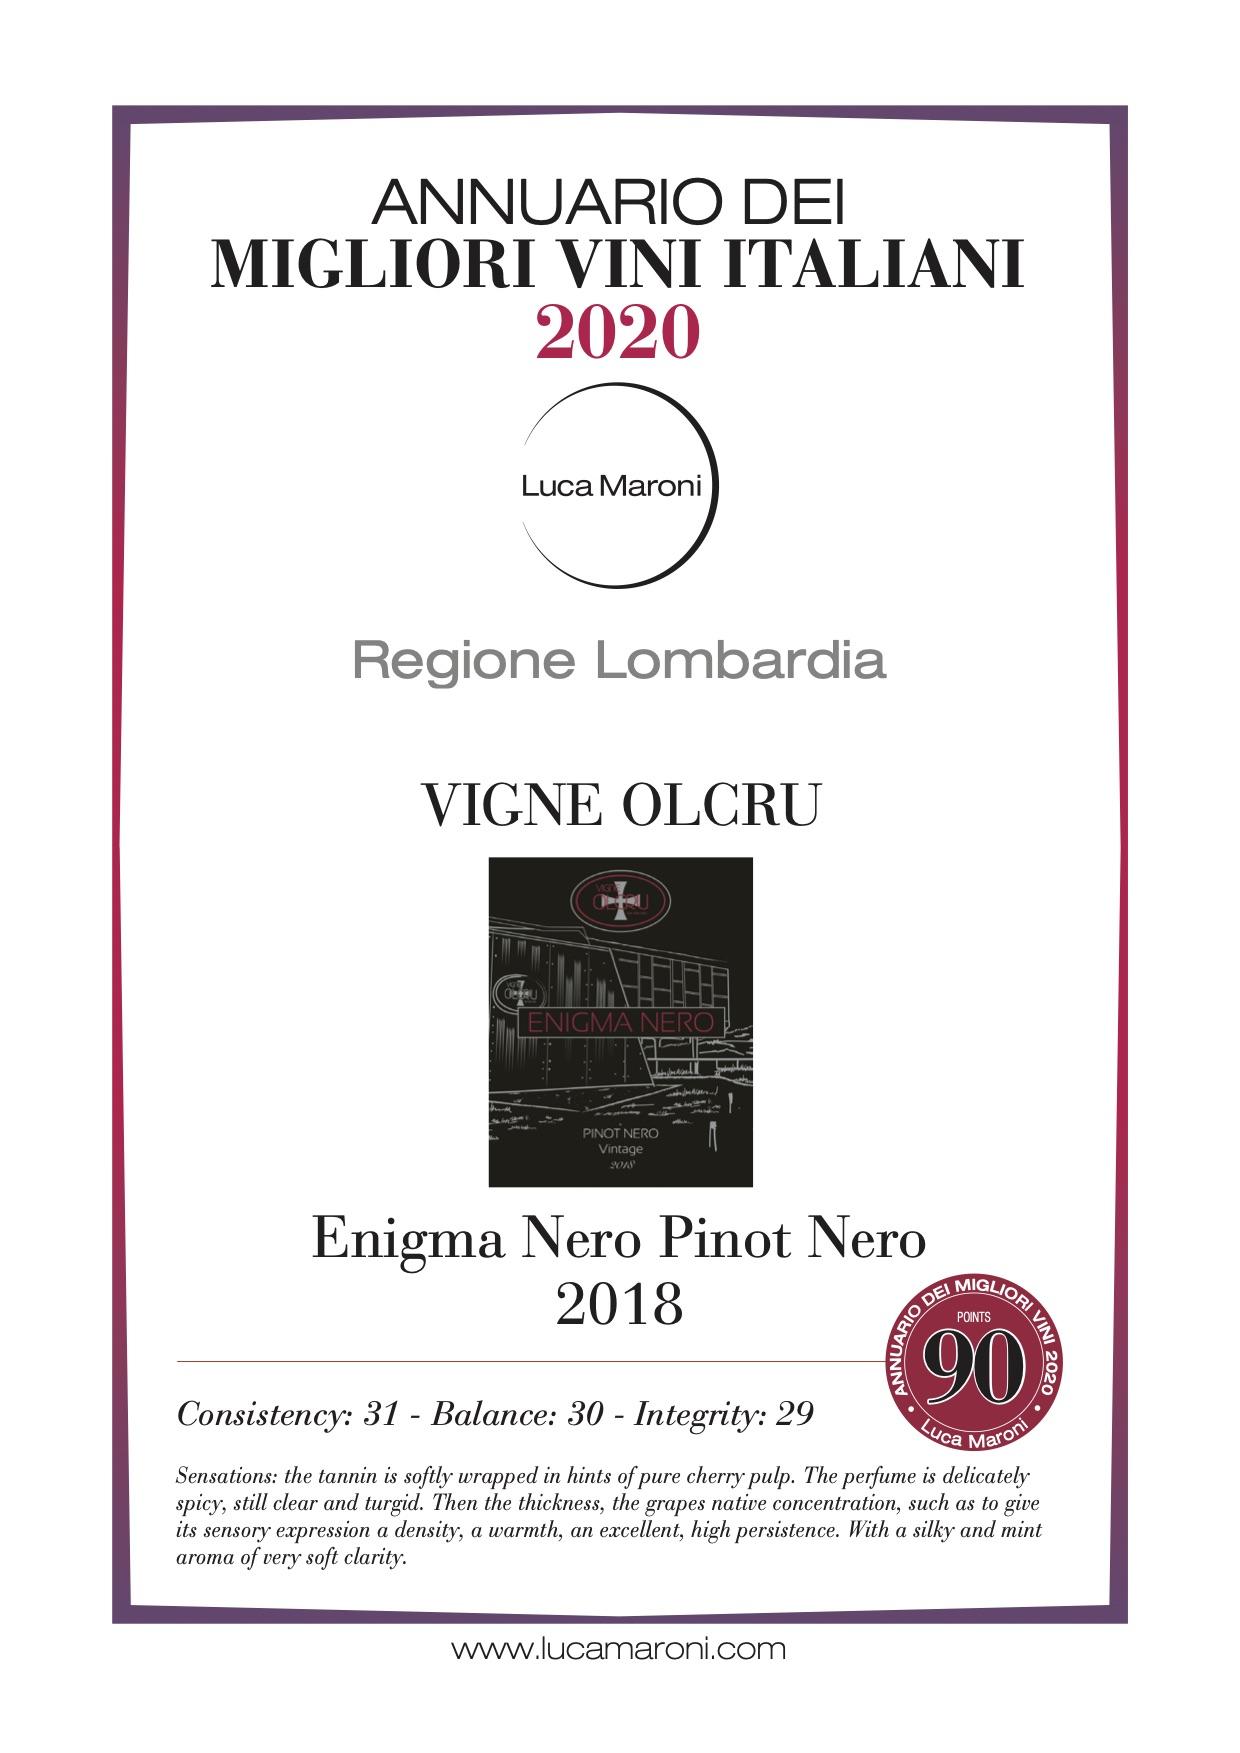 Luca Maroni 2020 – Enigma Nero 2018 eng